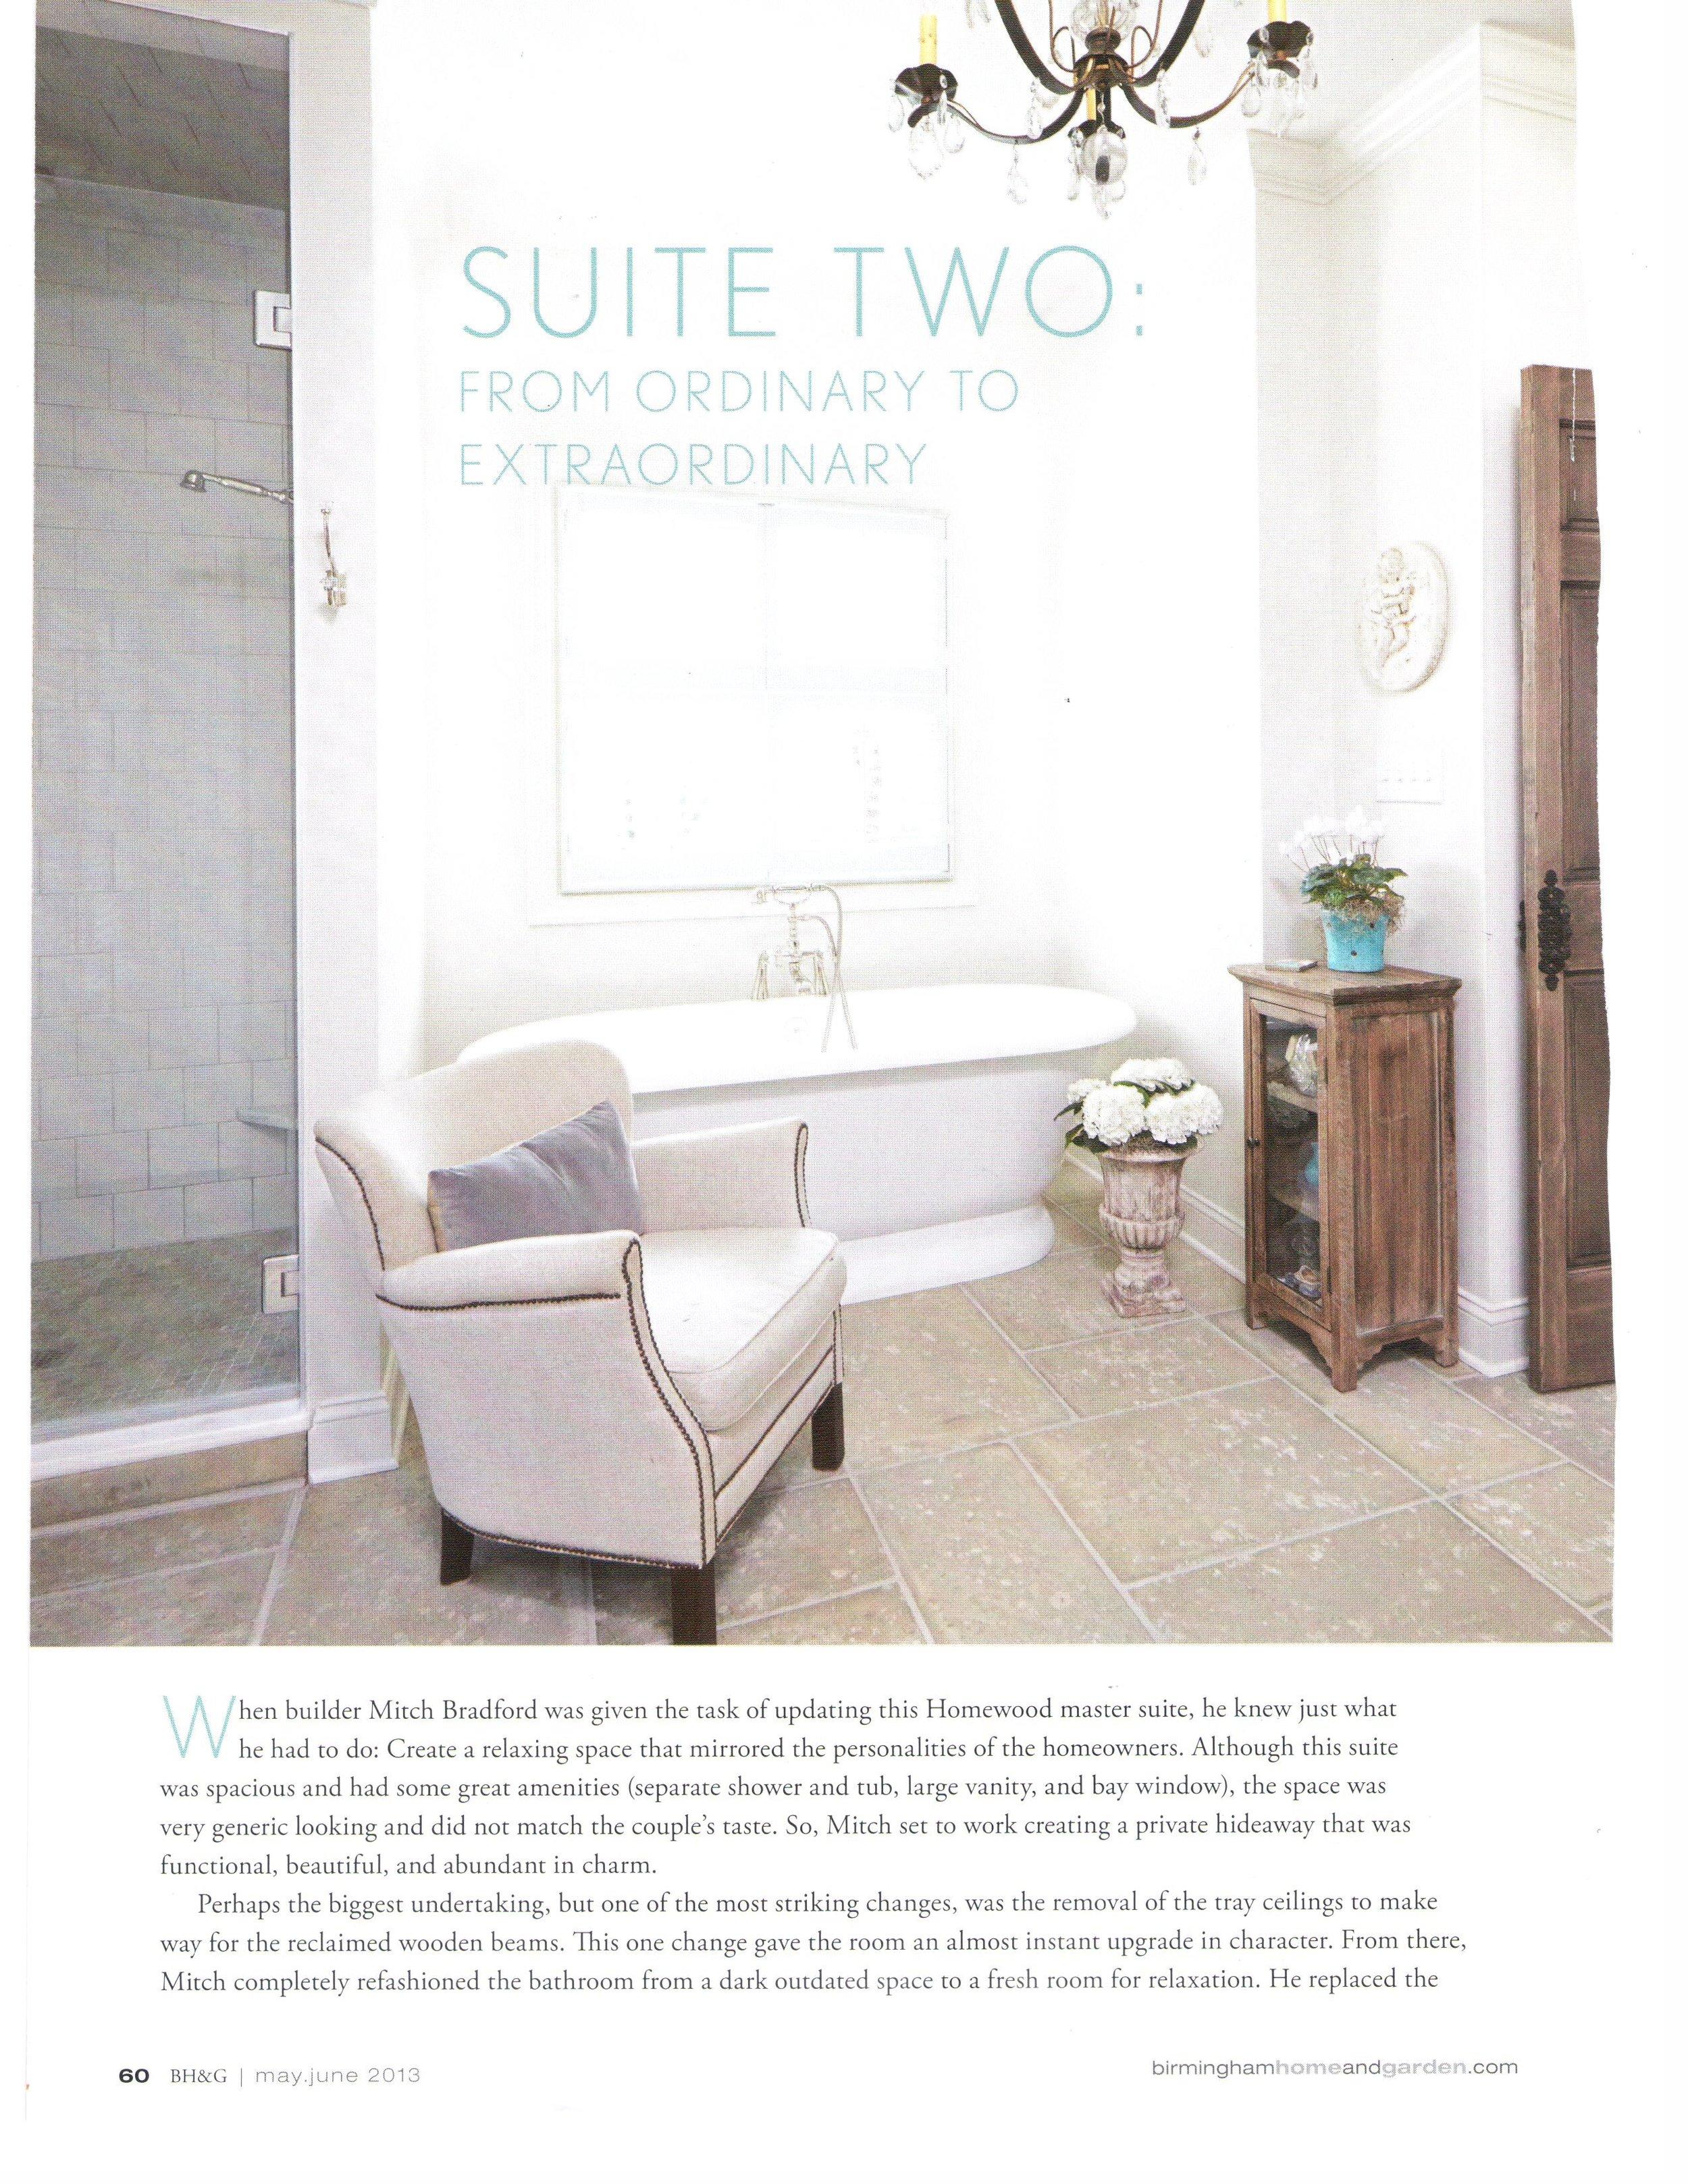 B'Ham Home & Garden Suite Upgrade magazine page 5 architecture exterior and interior design Alabama